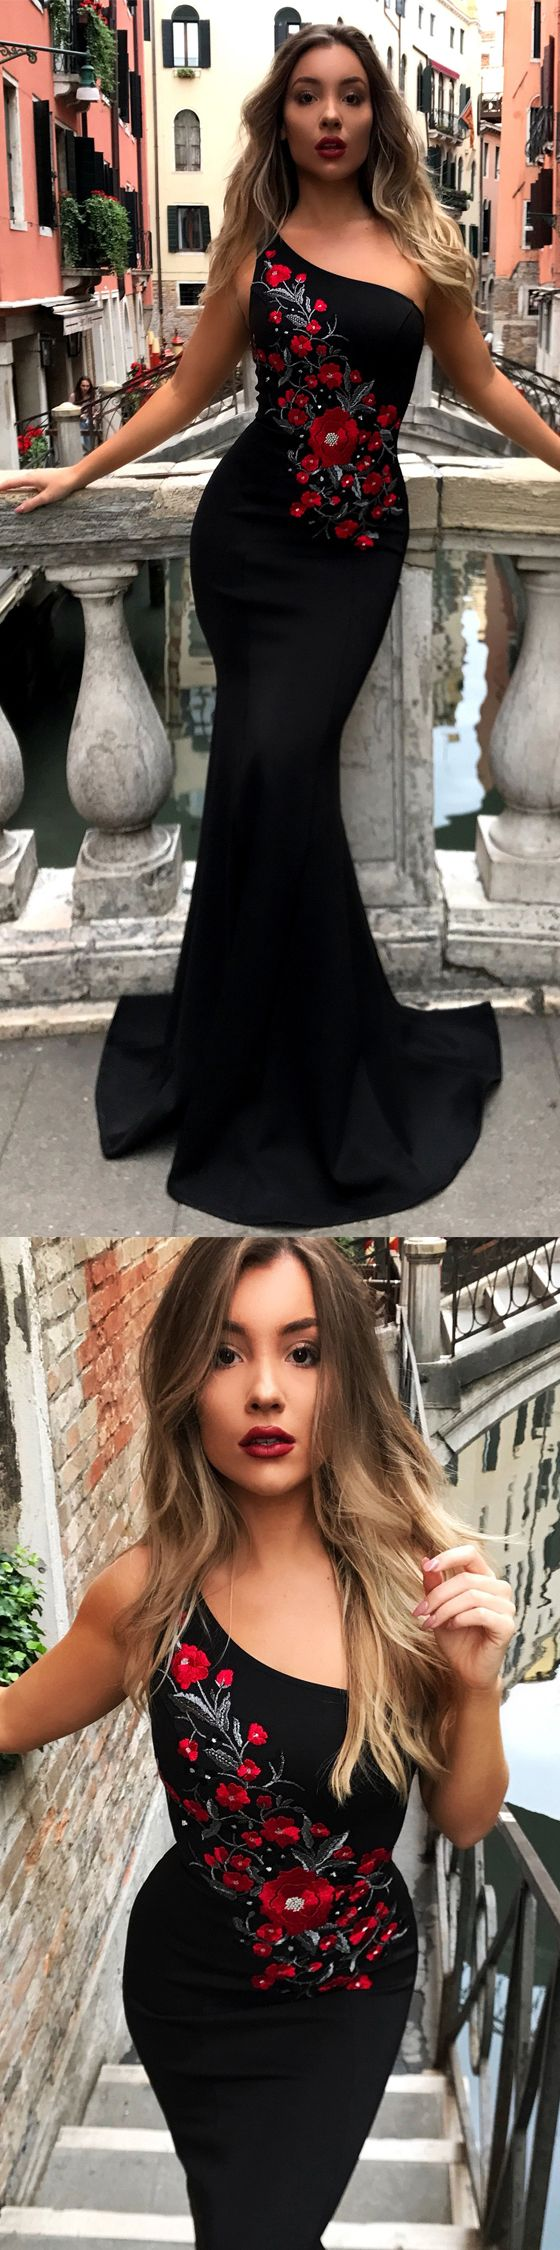 One Shoulder Mermaid Black Embroidery Pretty Long Prom Dresses, Cheap Prom Dresses #Sofiebridal #promdresses #promdressshopping #embroidery #black #mermaid #prom2k18